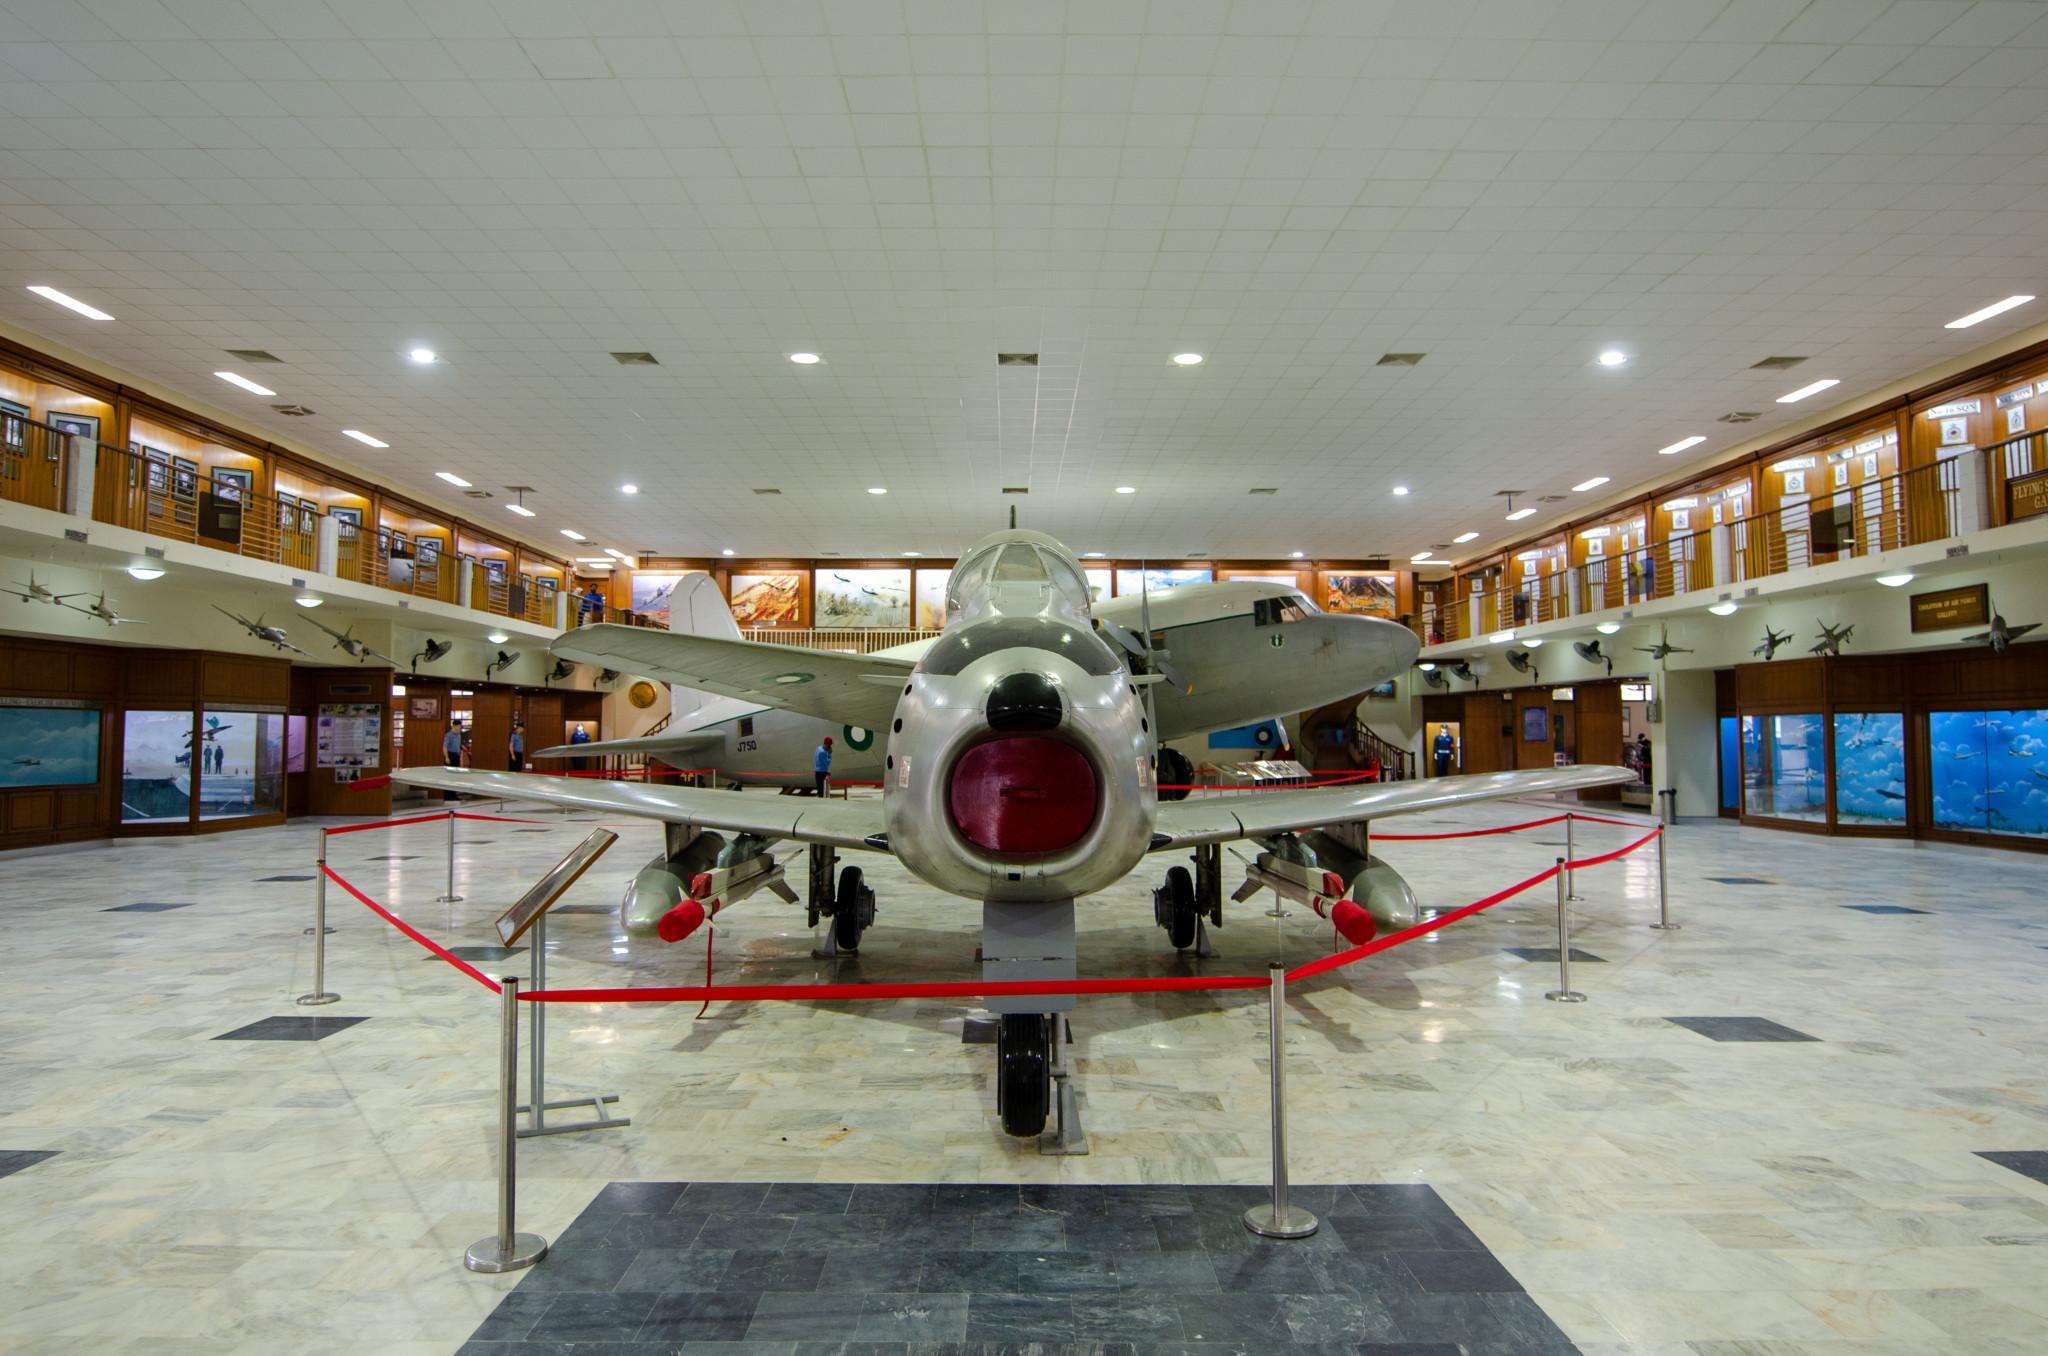 Folland Gnat im Pakistan Air Force Museum